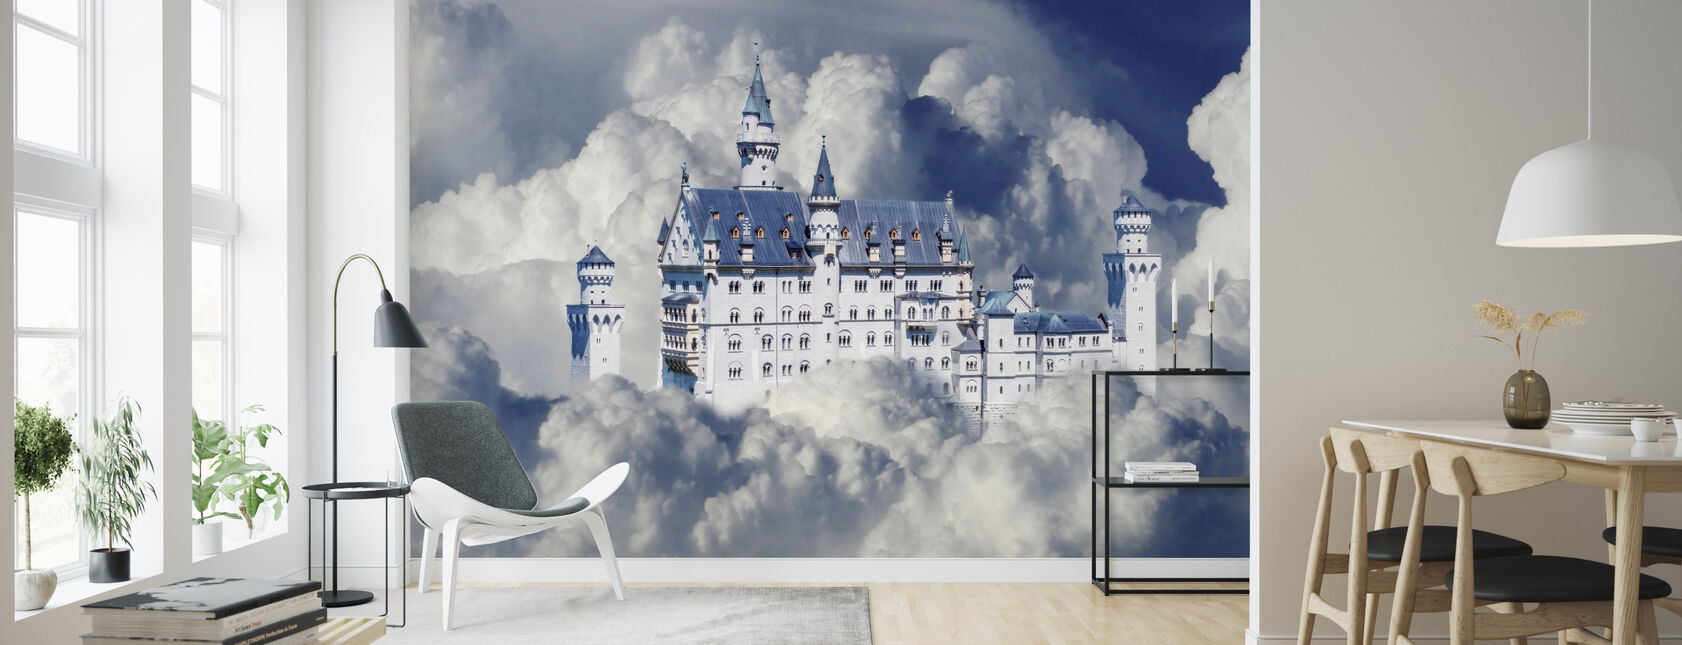 Fairy Tale Castle - Wallpaper - Living Room